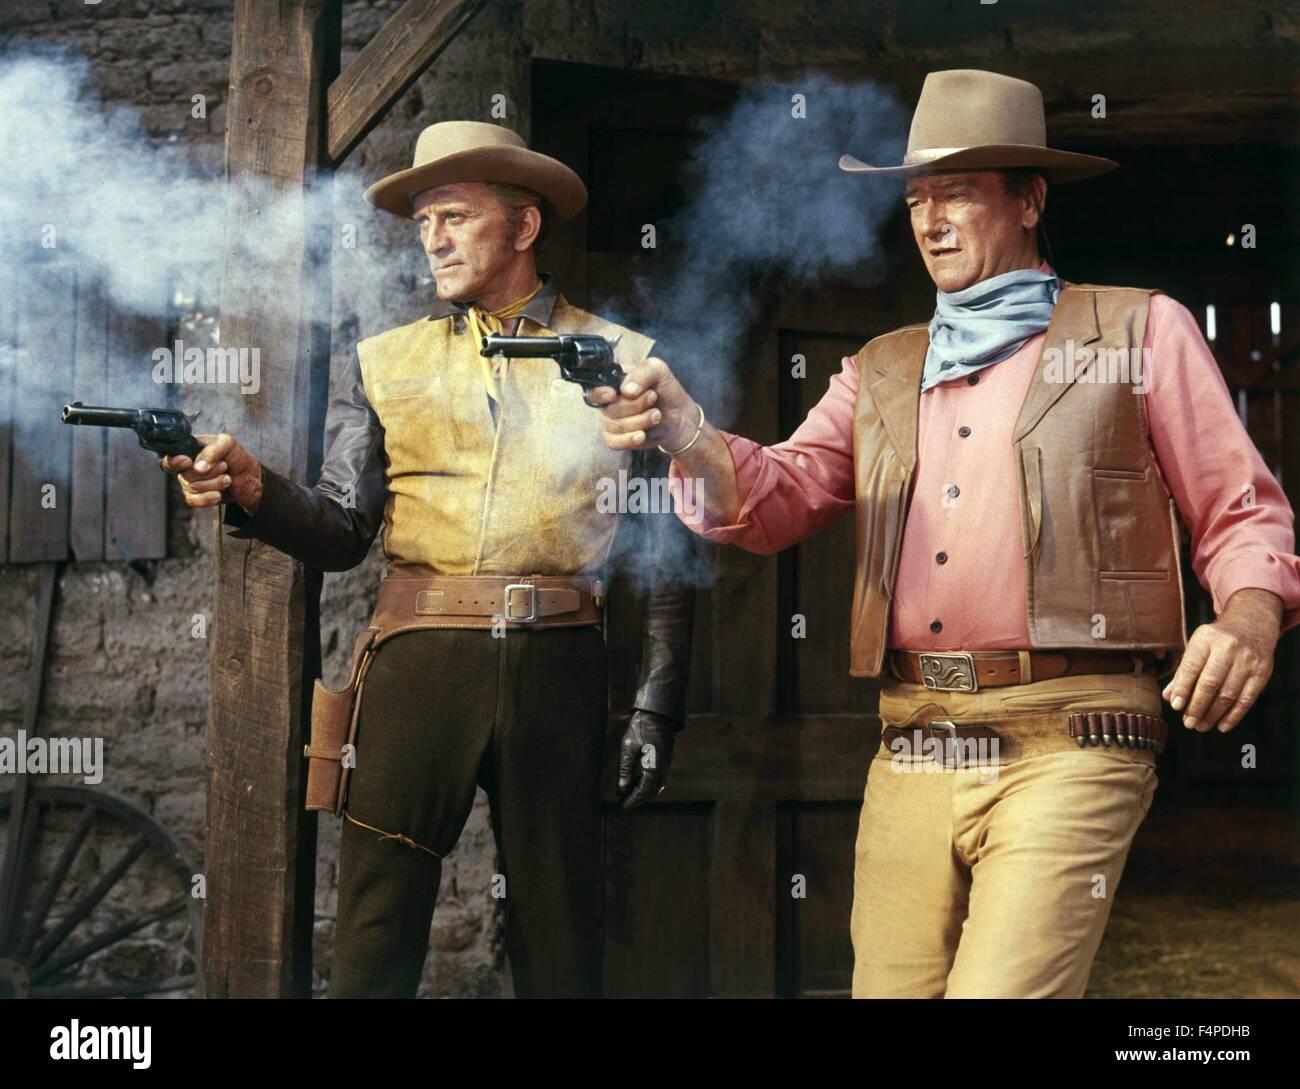 Kirk Douglas, John Wayne / The War Wagon 1967 directed by Burt Kennedy - Stock Image